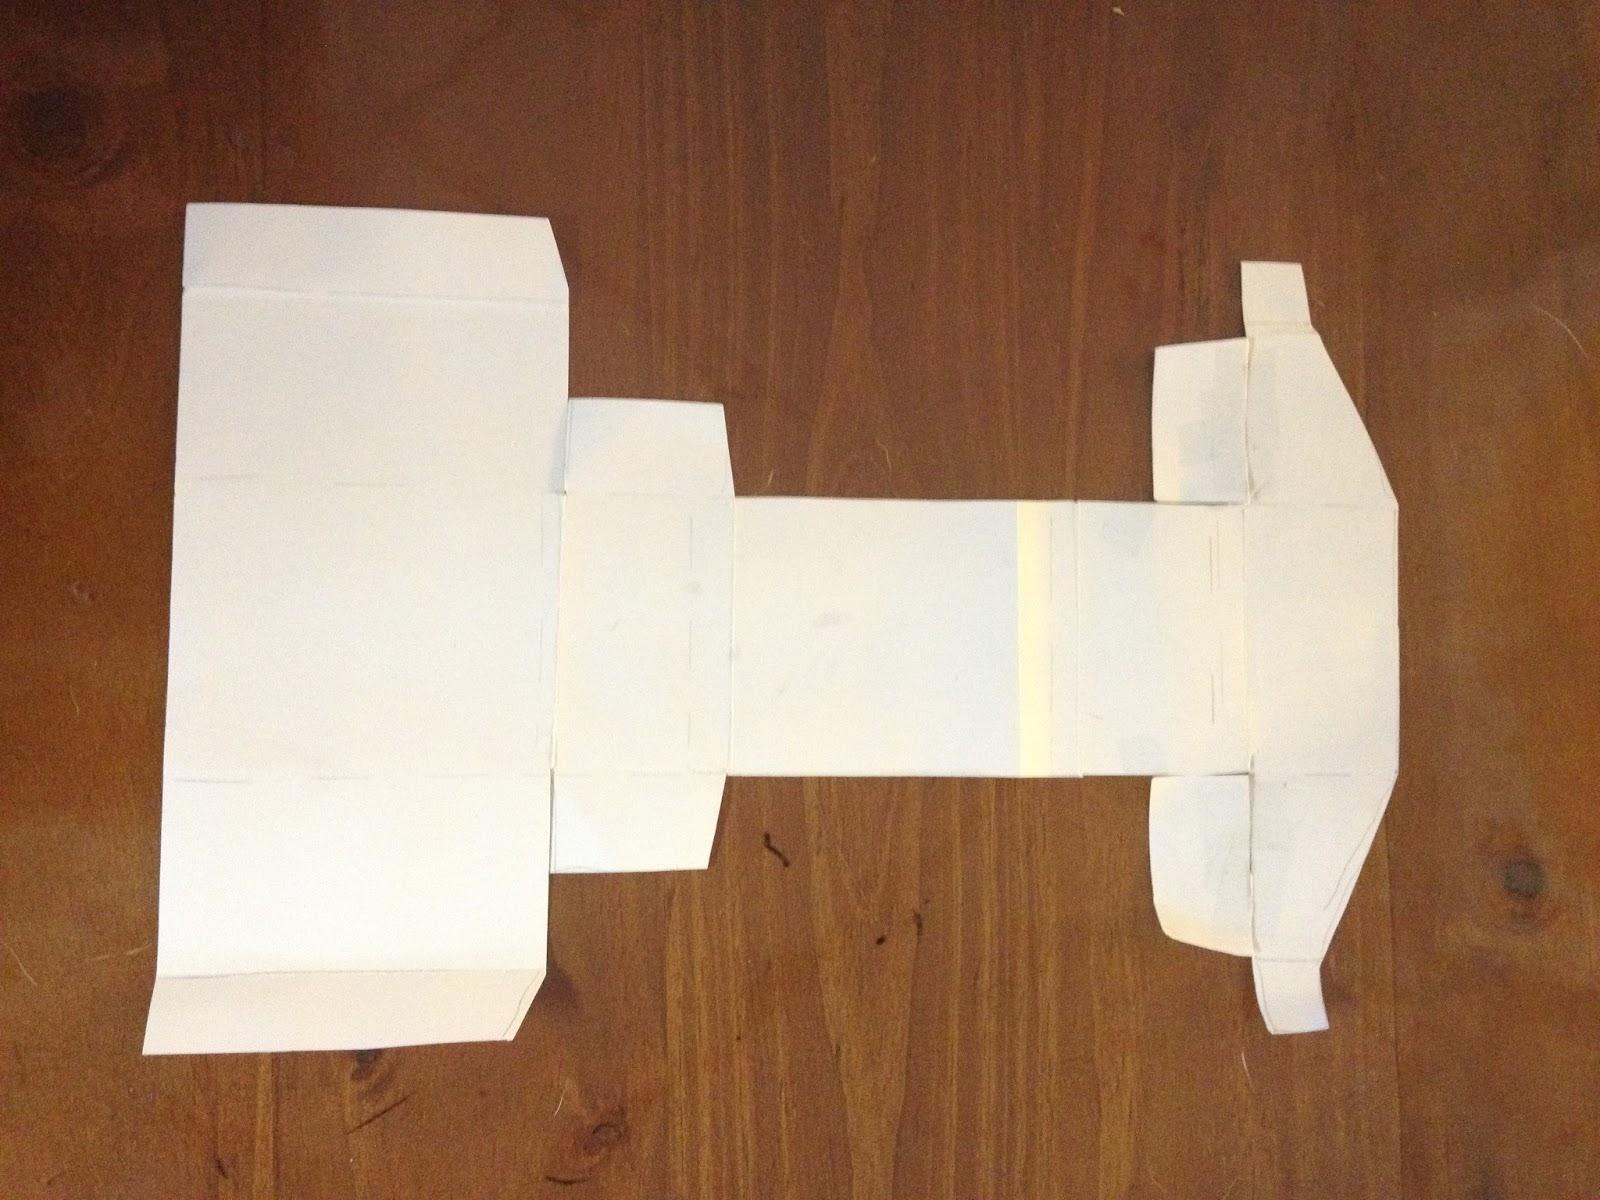 magic warlord deck box template. Black Bedroom Furniture Sets. Home Design Ideas